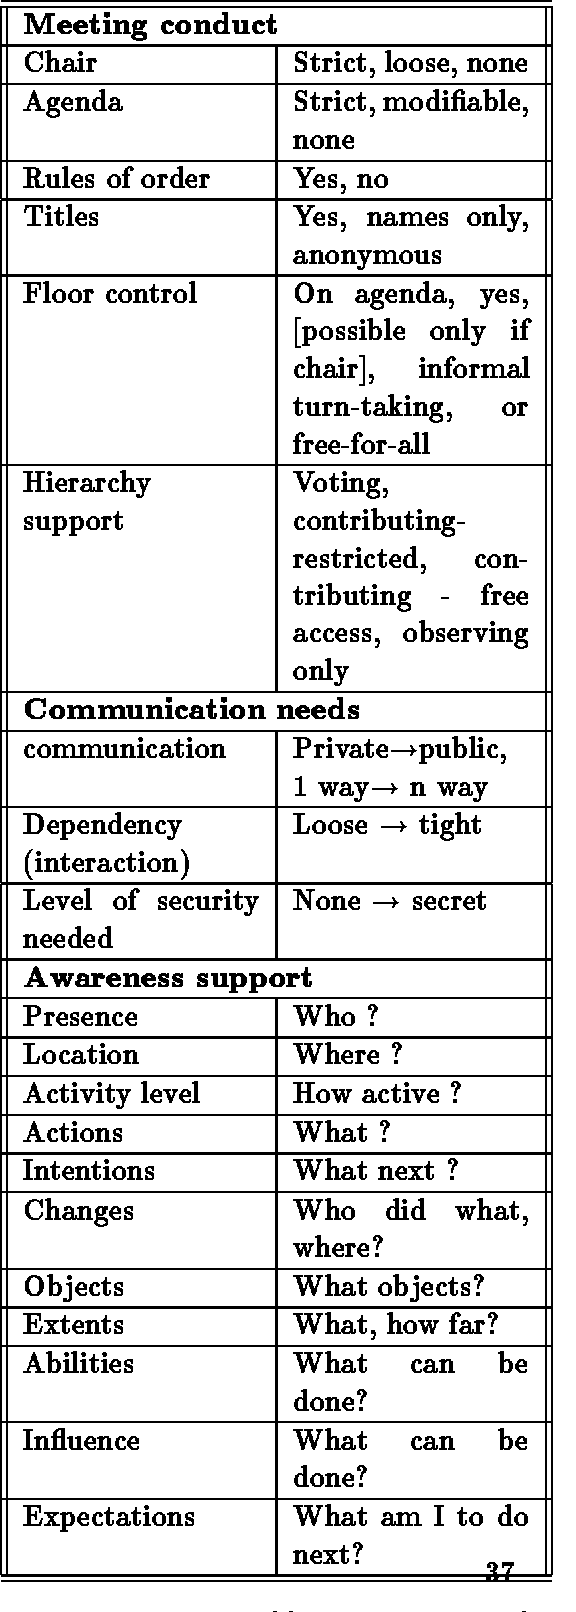 The Dependency Agenda (NONE)